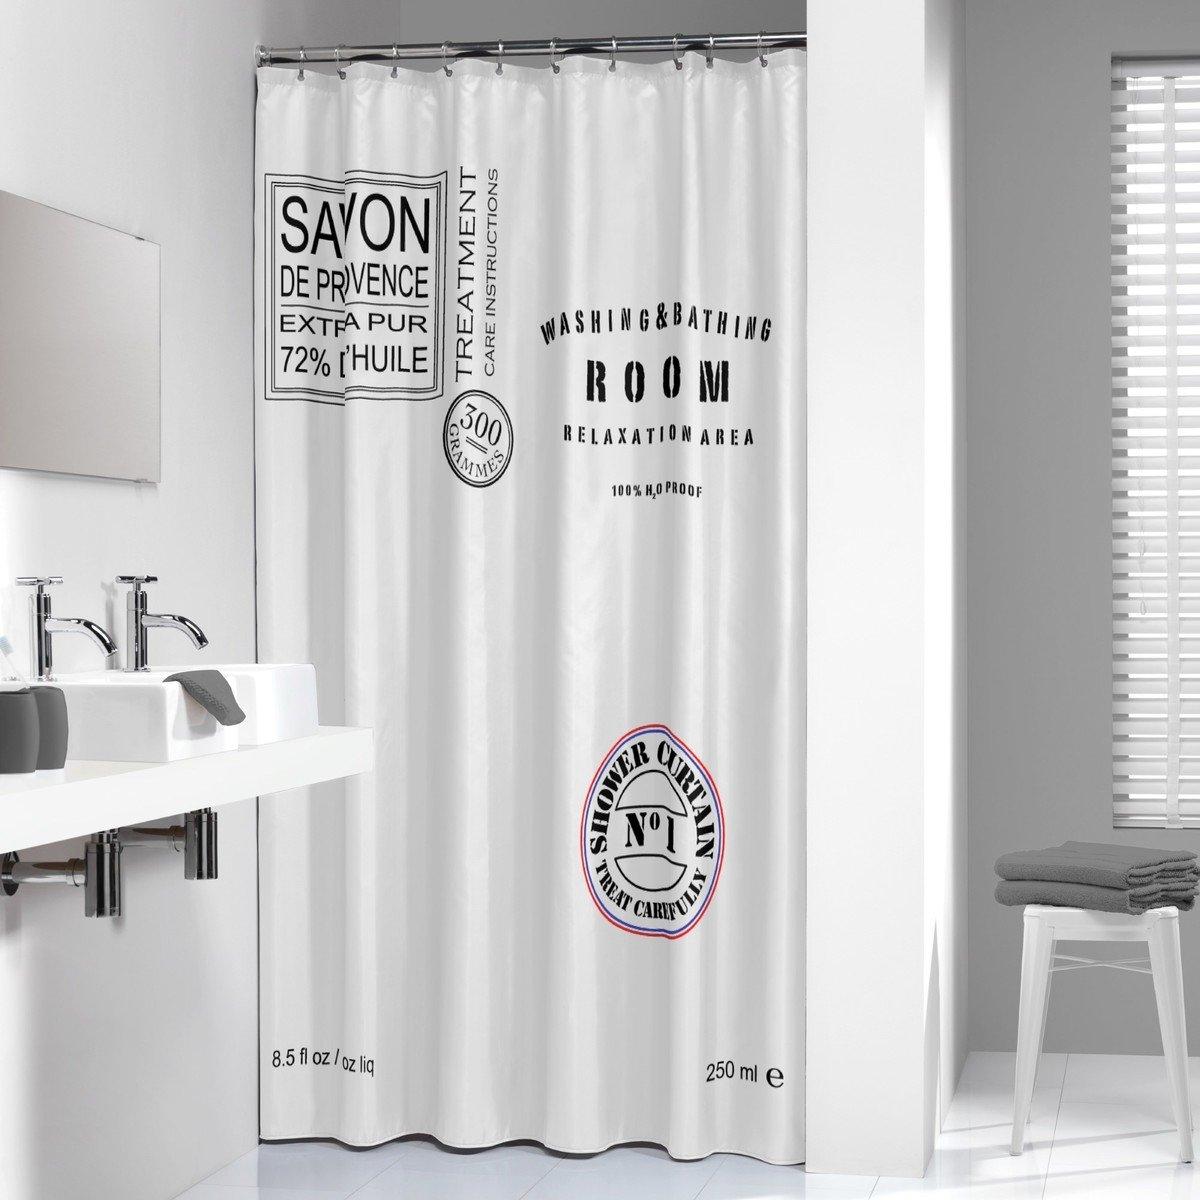 Sealskin douchegordijn Savon de Provence 100% polyester wit 180x200 cm